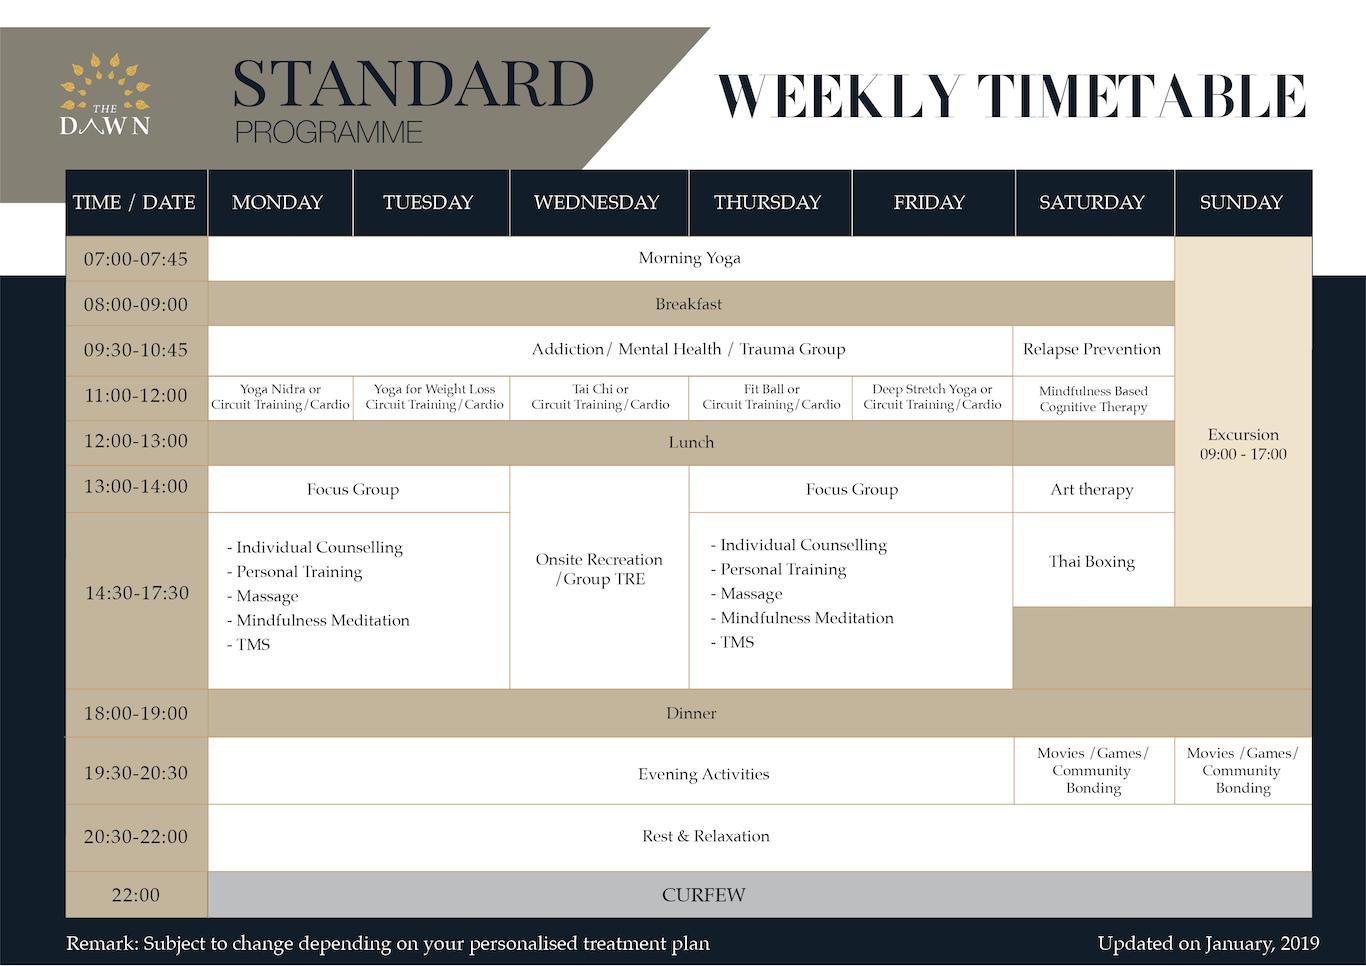 Standard_Revised_4_Jan_2019